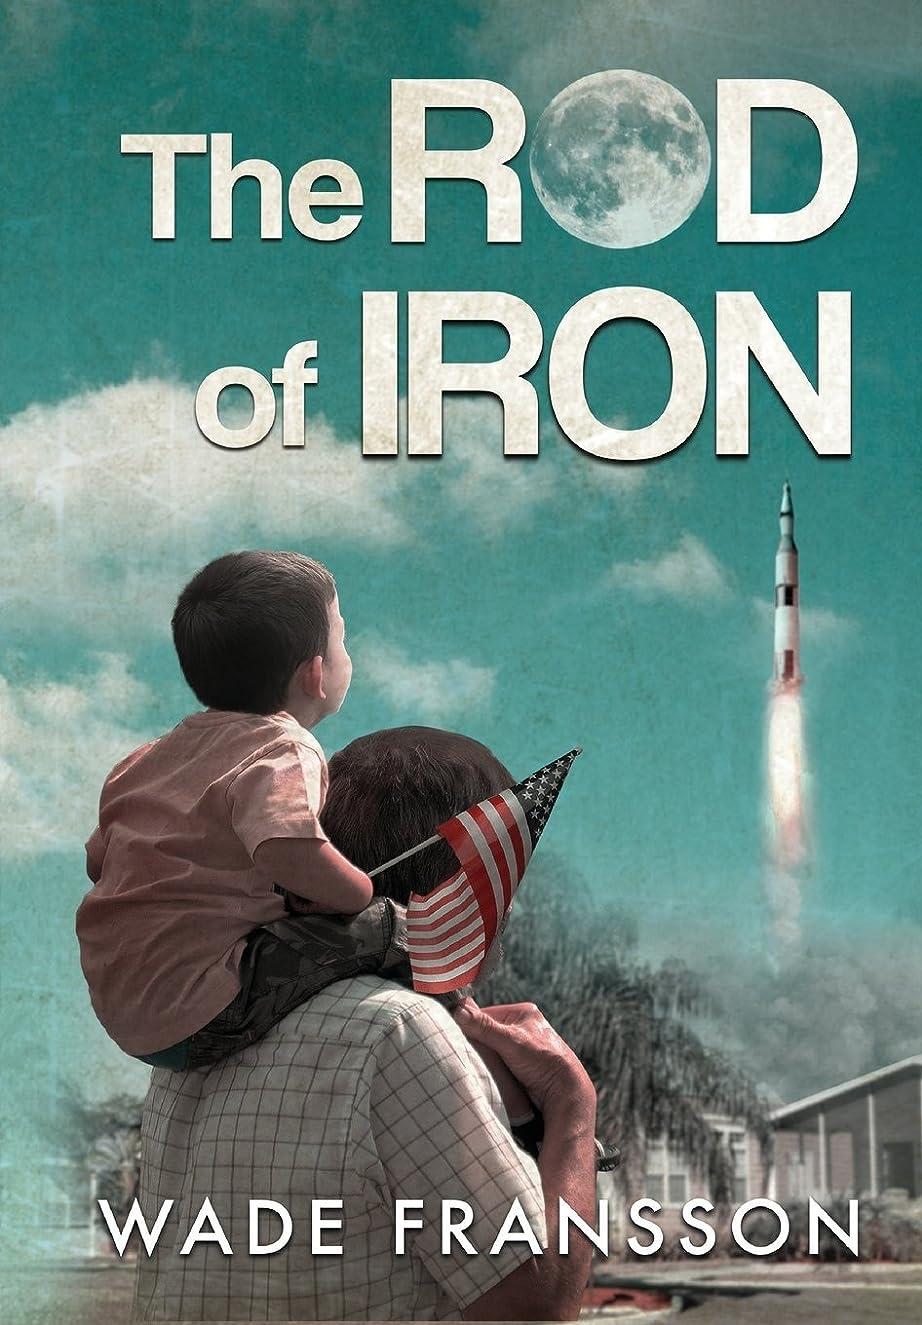 The Rod of Iron